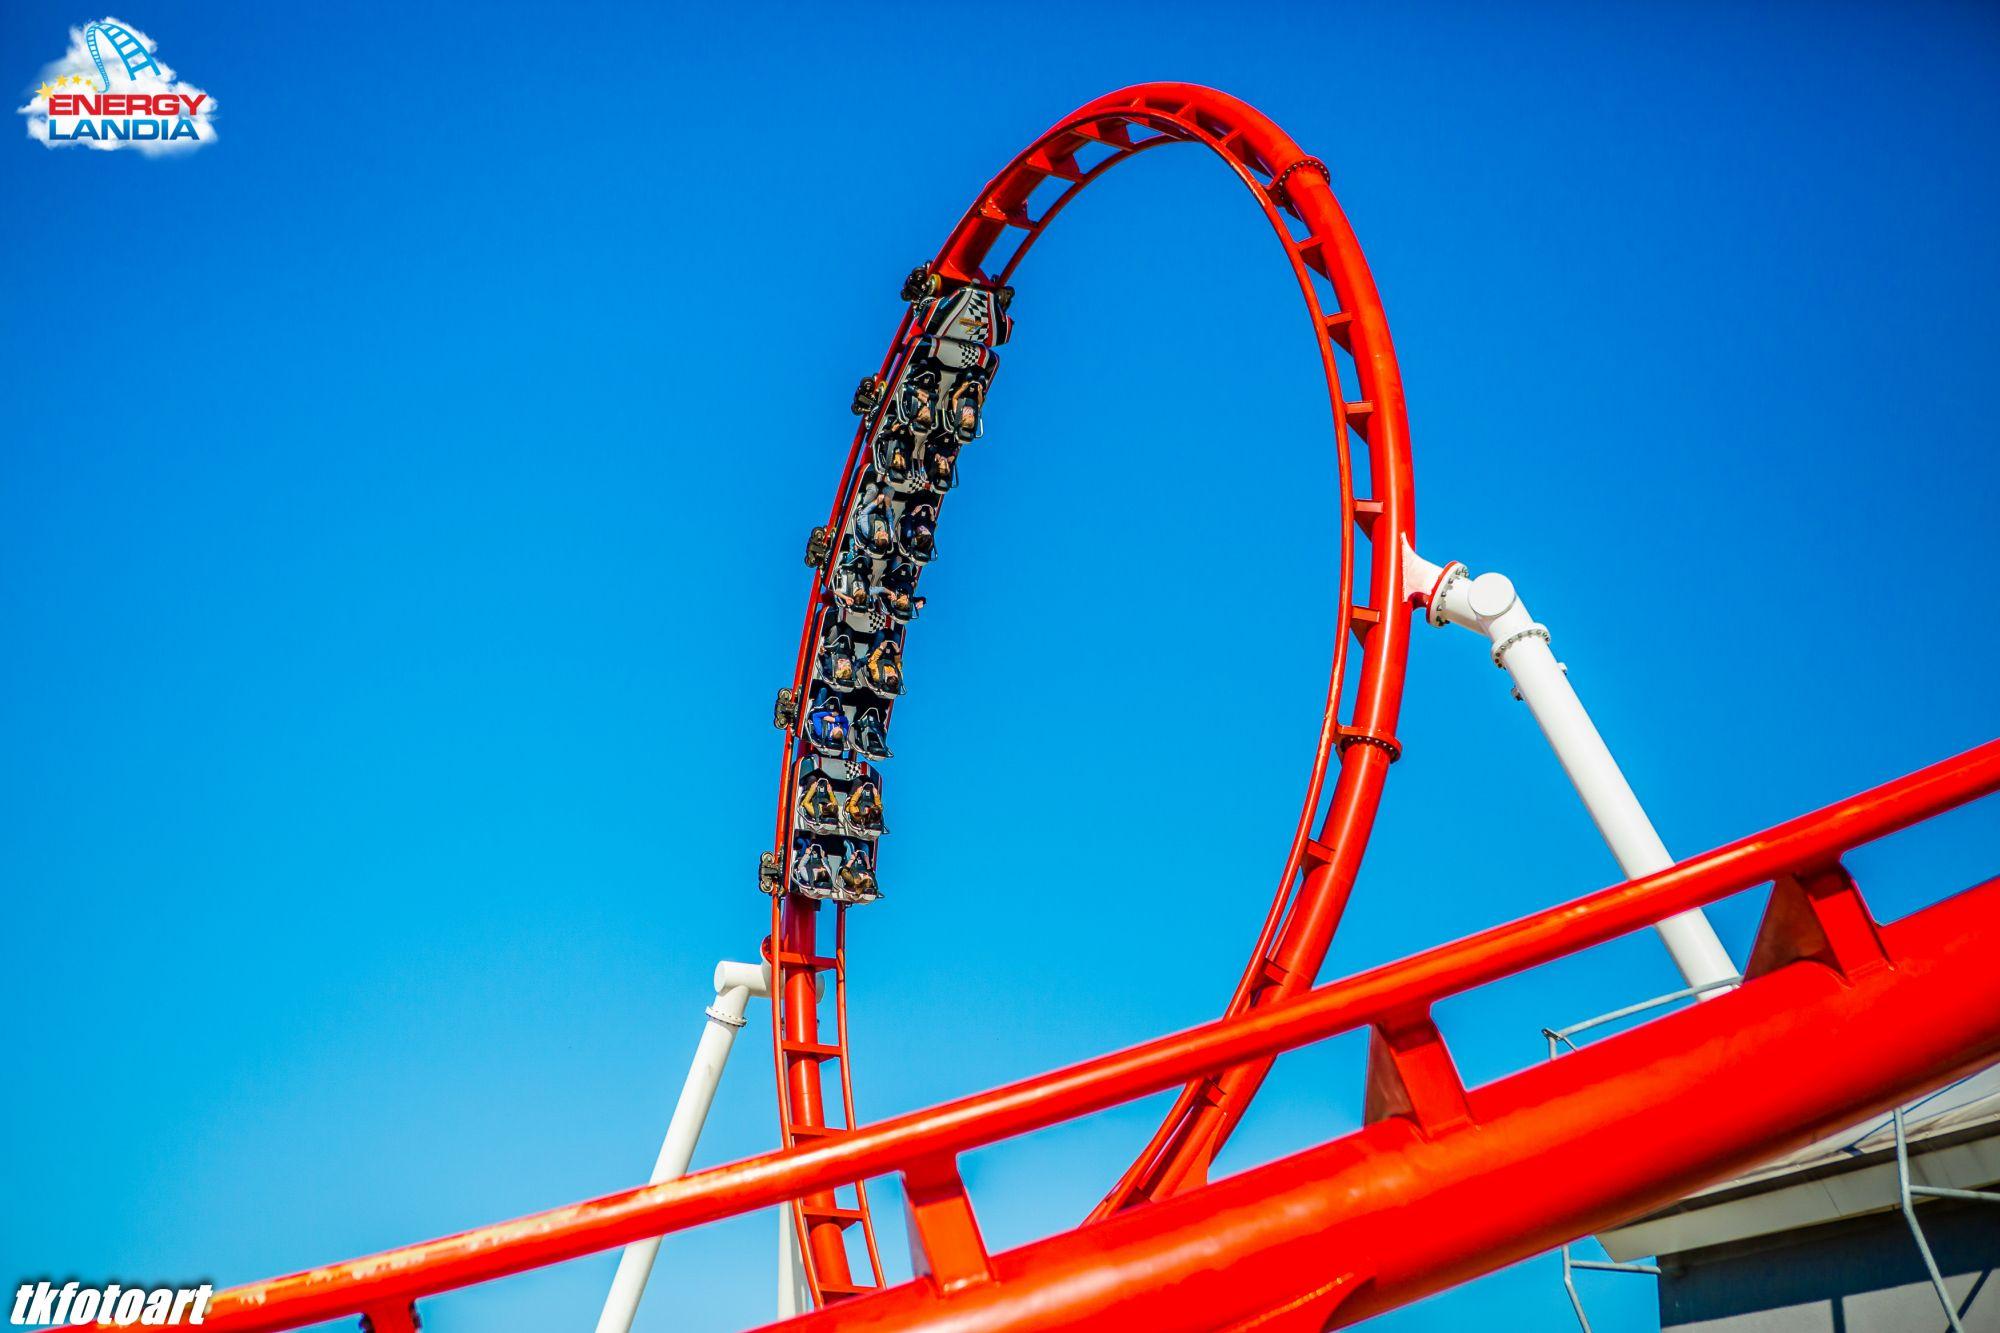 Energylandia rollercoaster